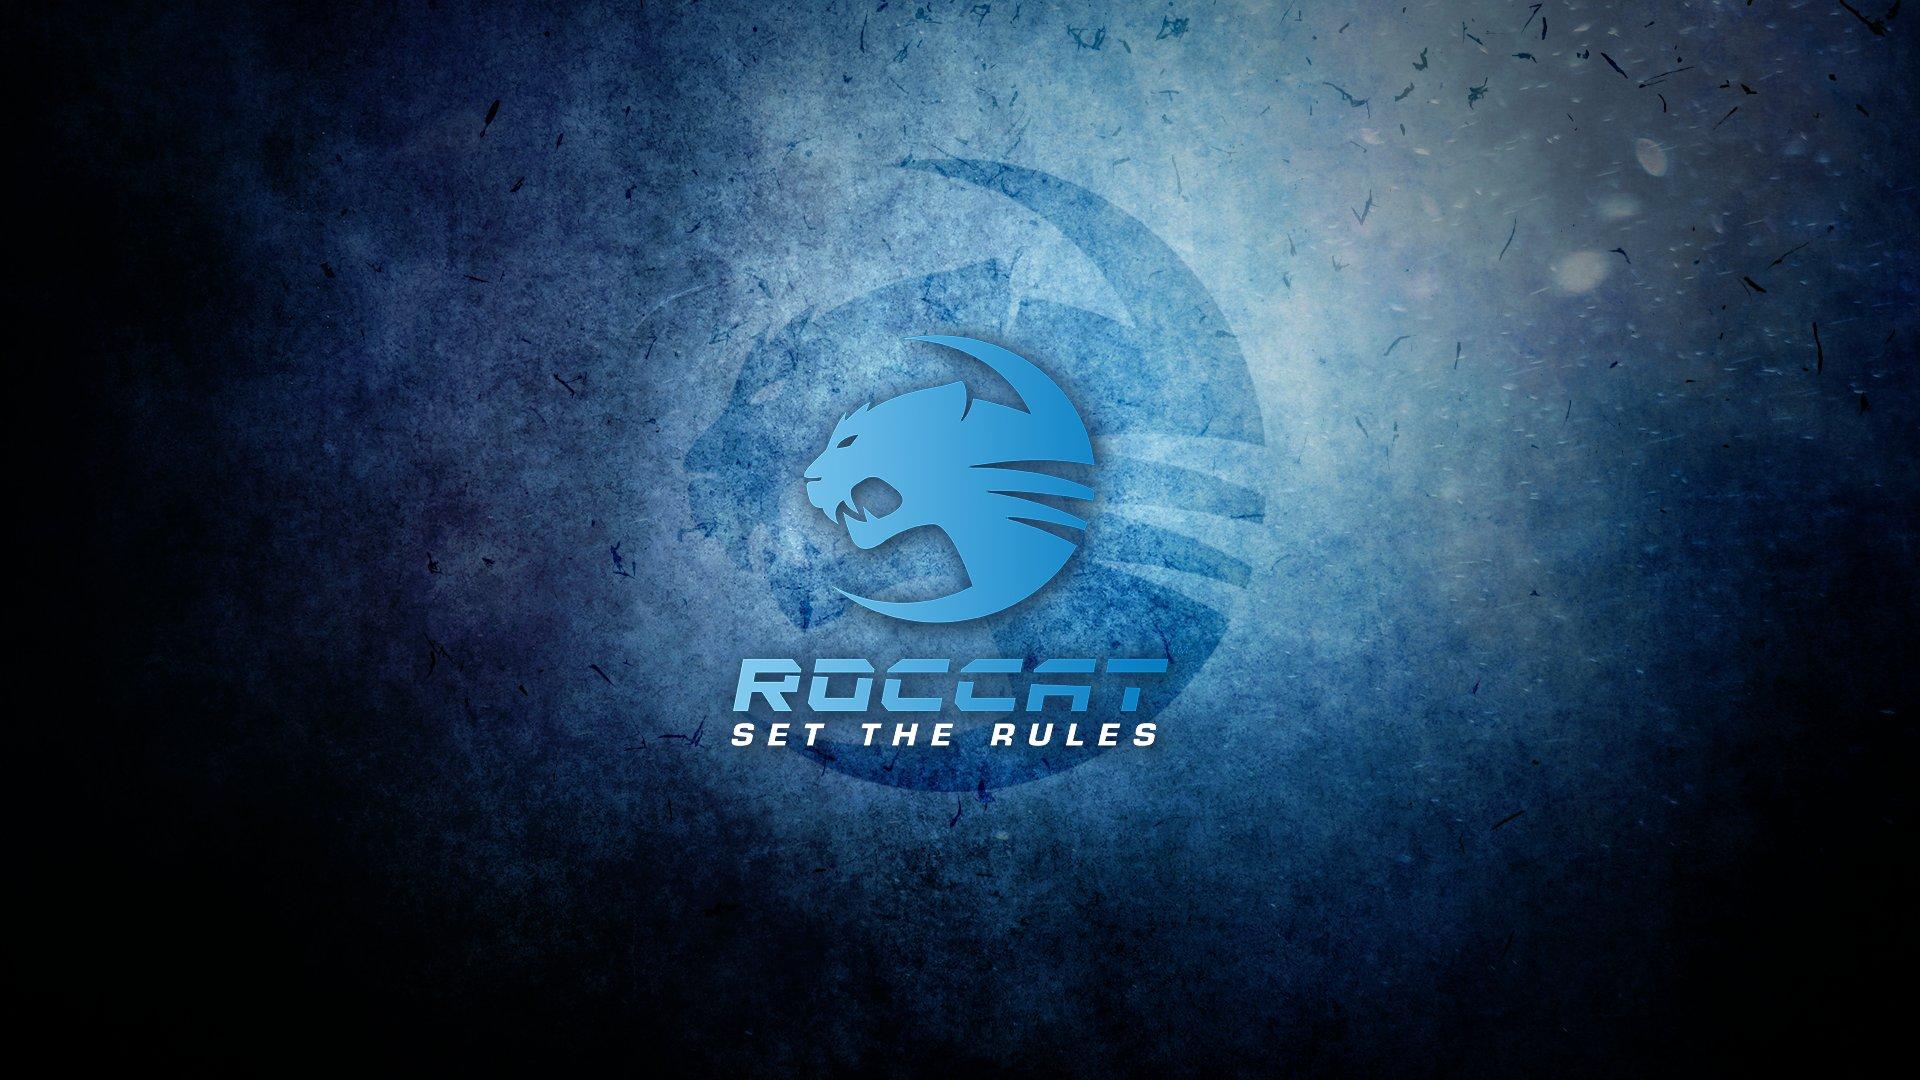 download roccat logo wallpaper - photo #8